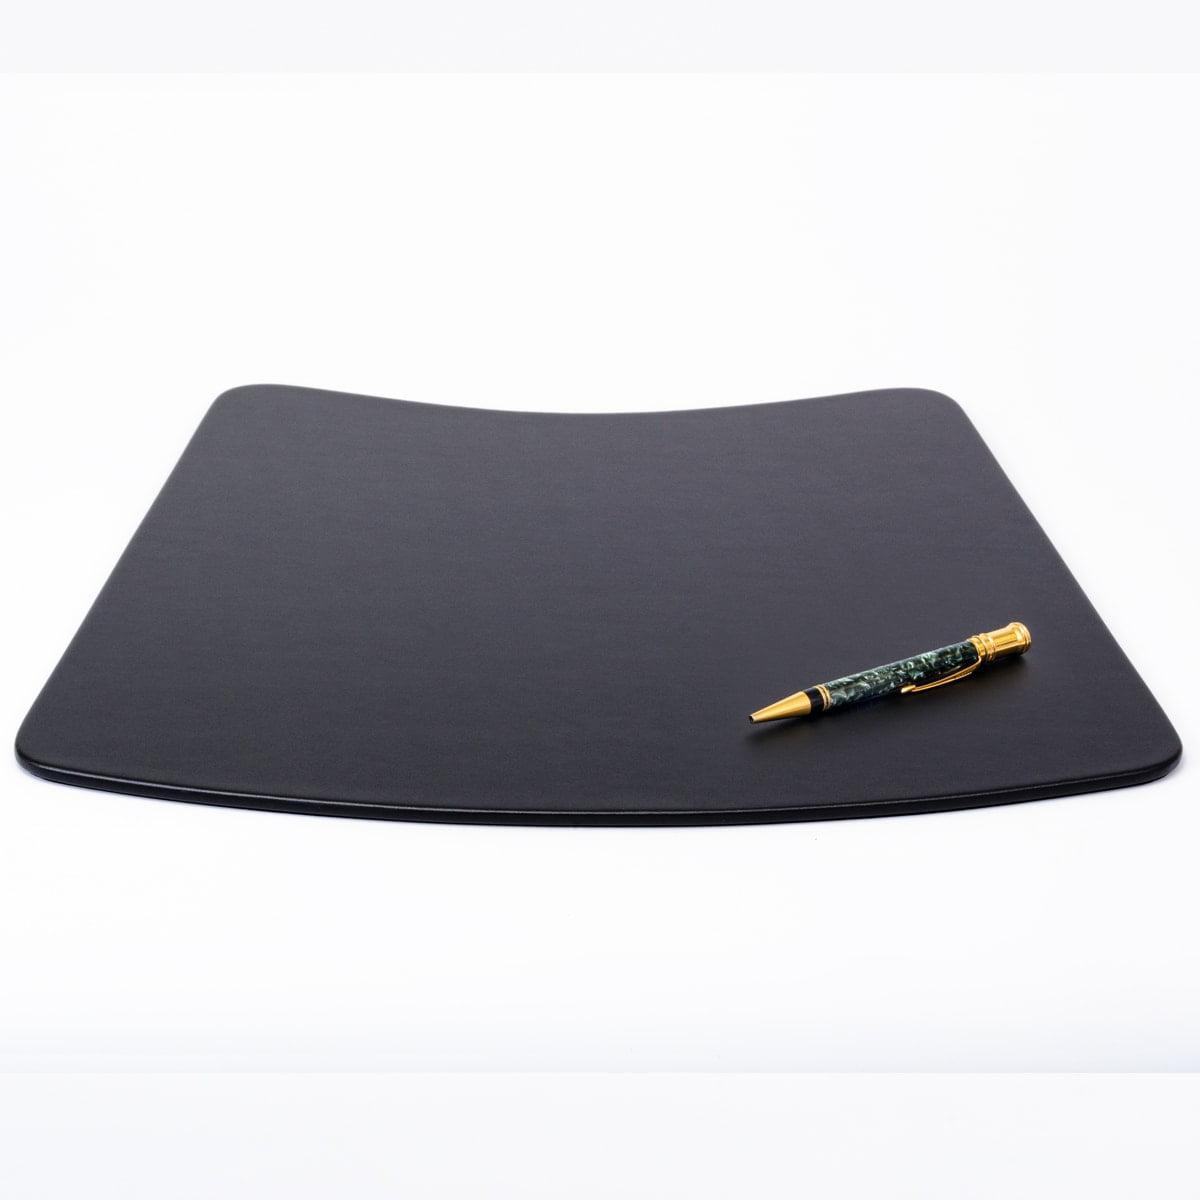 Black Leatherette Conference Pad For Round Table Walmart Com Walmart Com